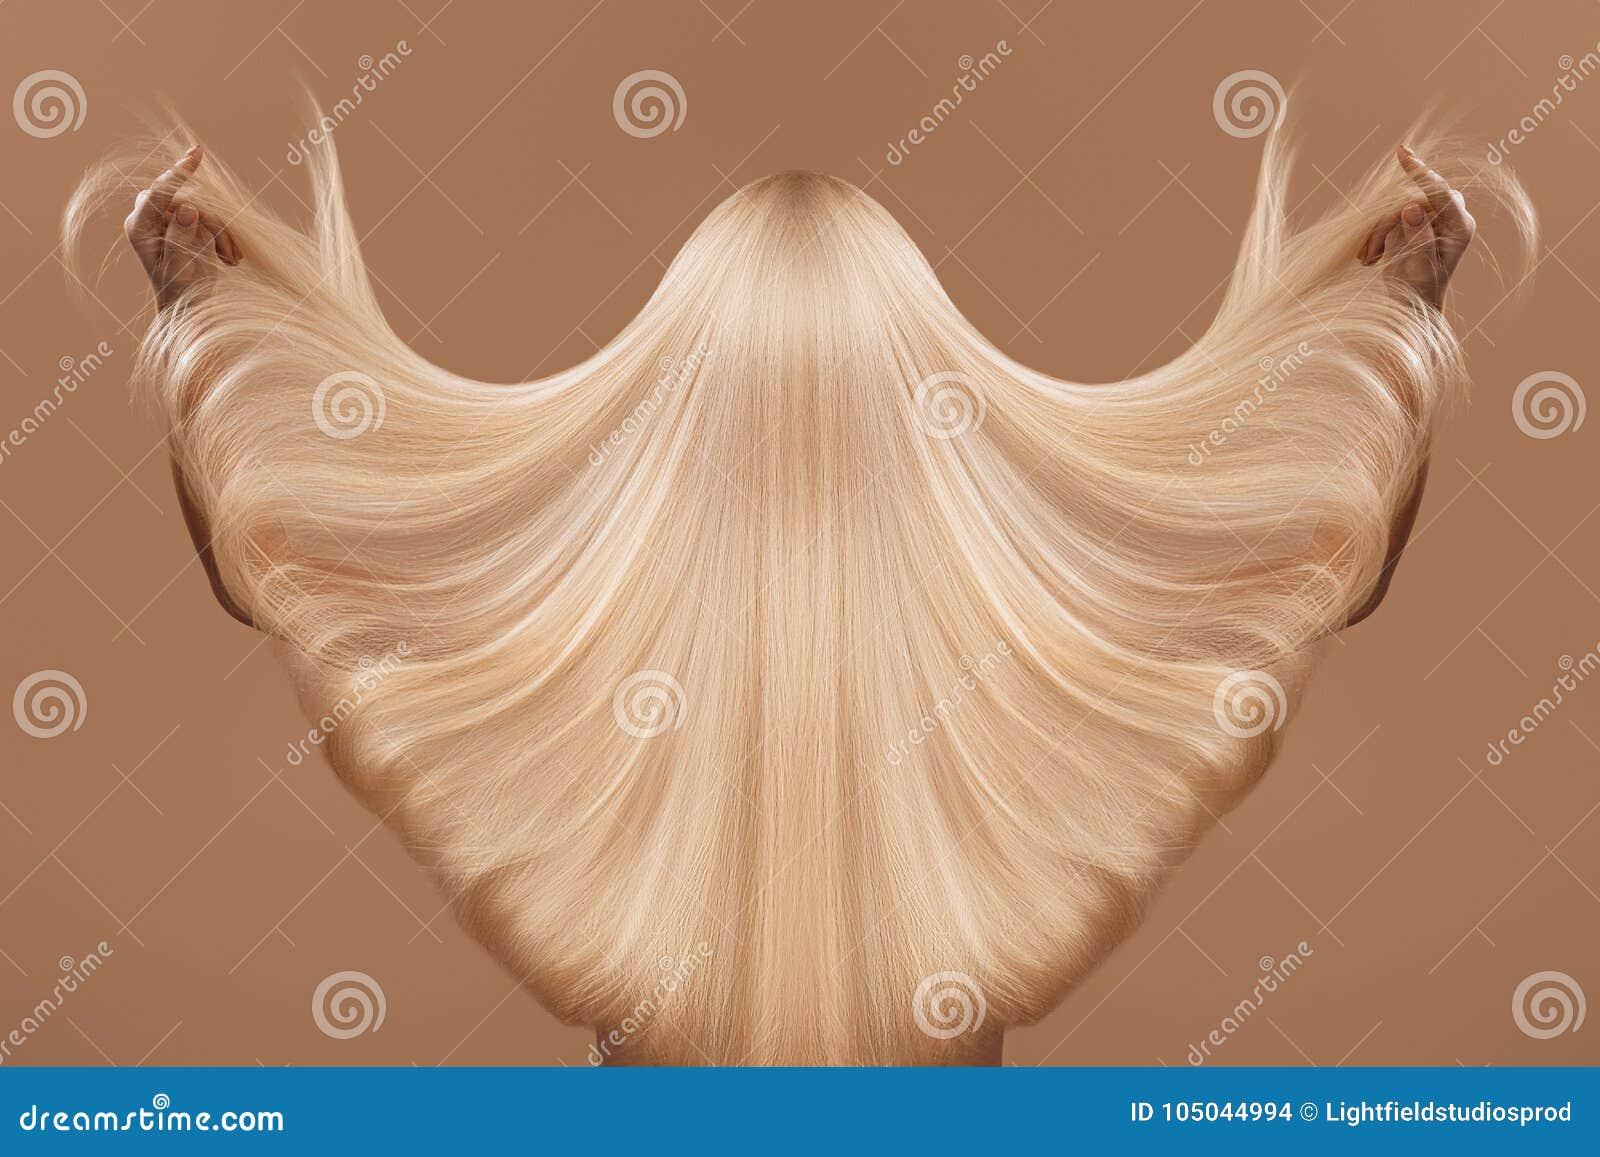 Download Haircare概念 库存照片. 图片 包括有 赤裸, 迷住, 人们, 全能, 裸体, beauvoir - 105044994